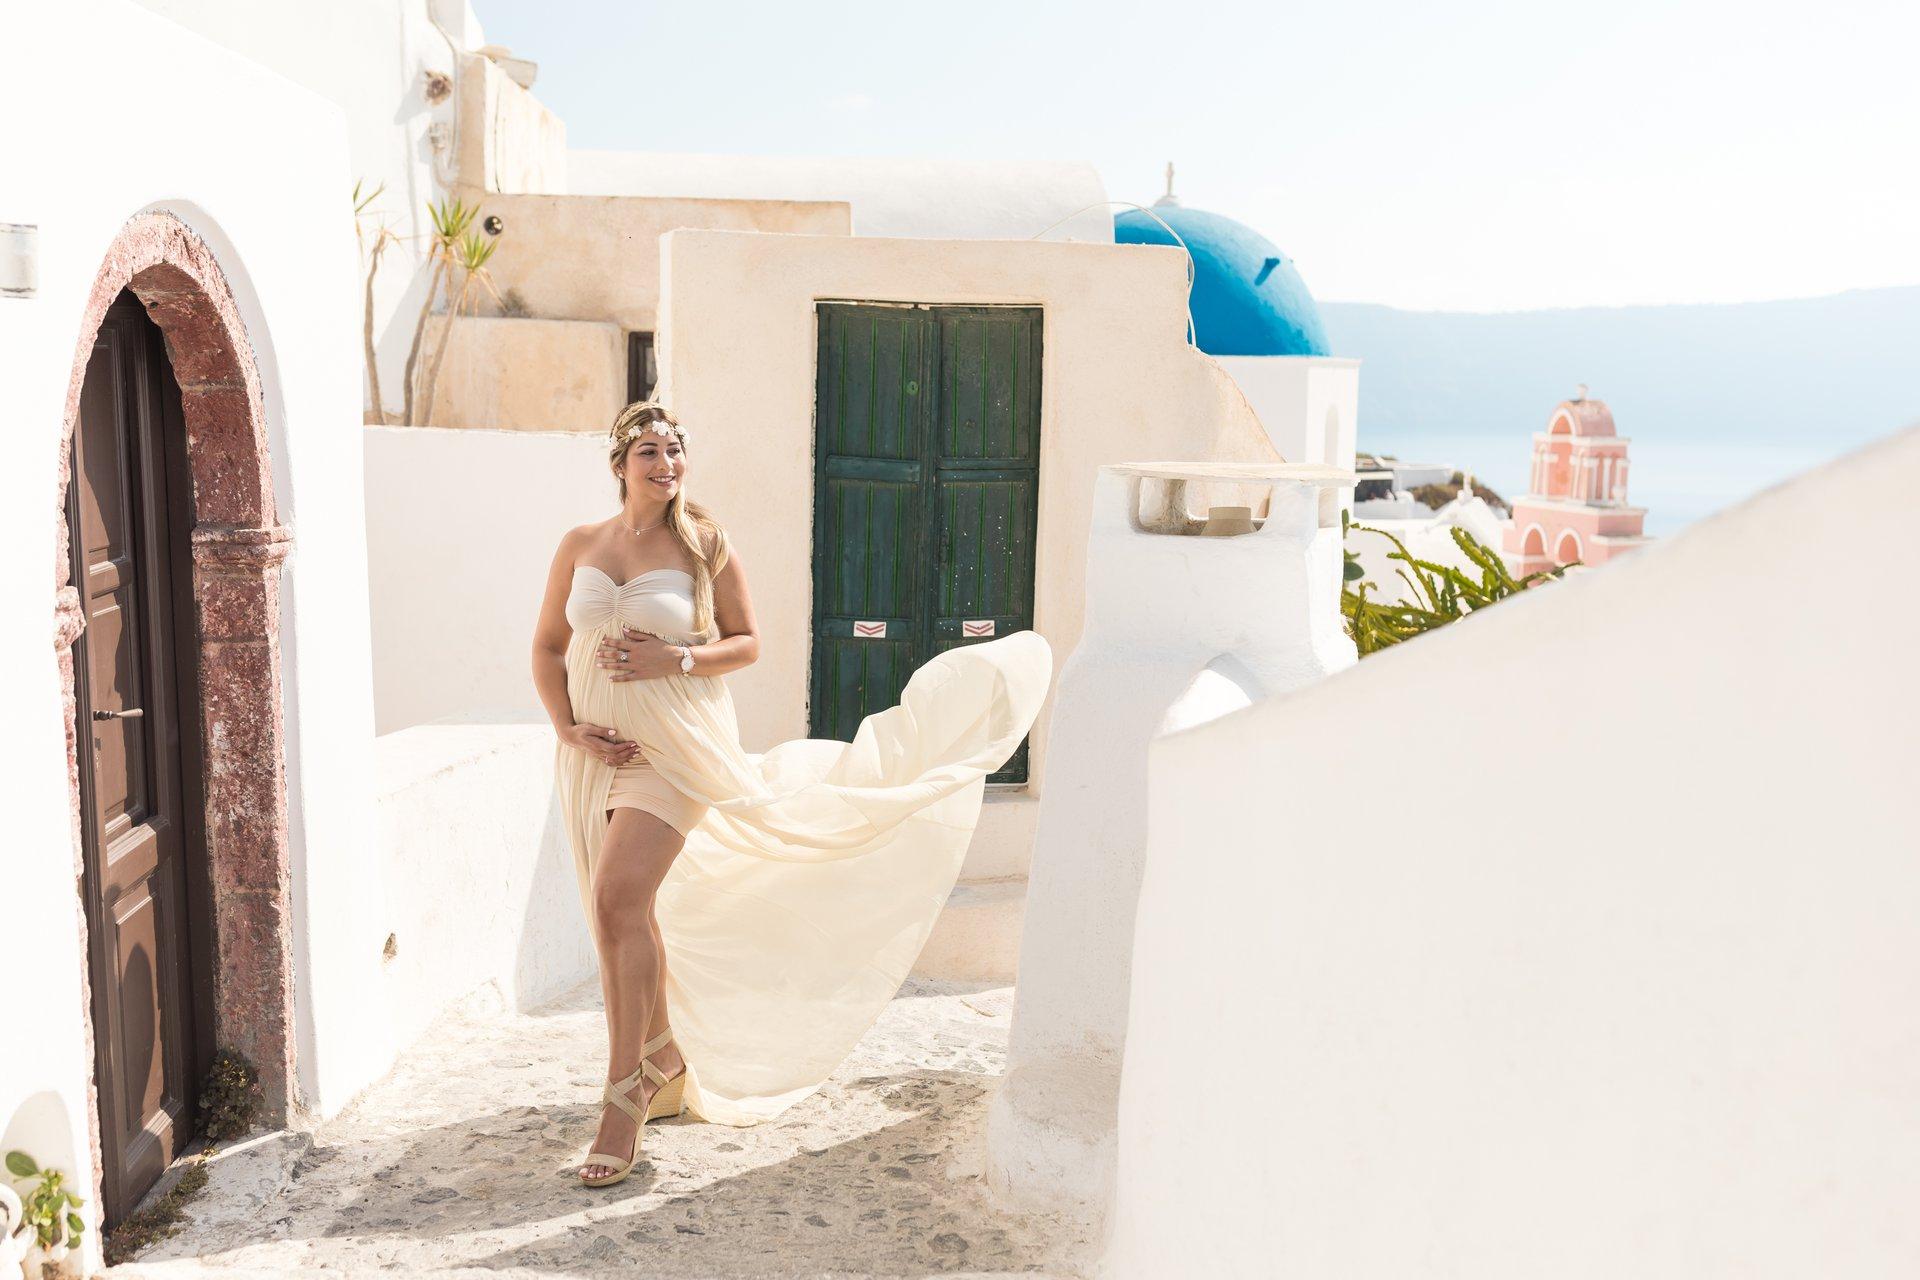 Santorini-Greece-travel-story-Flytographer-16